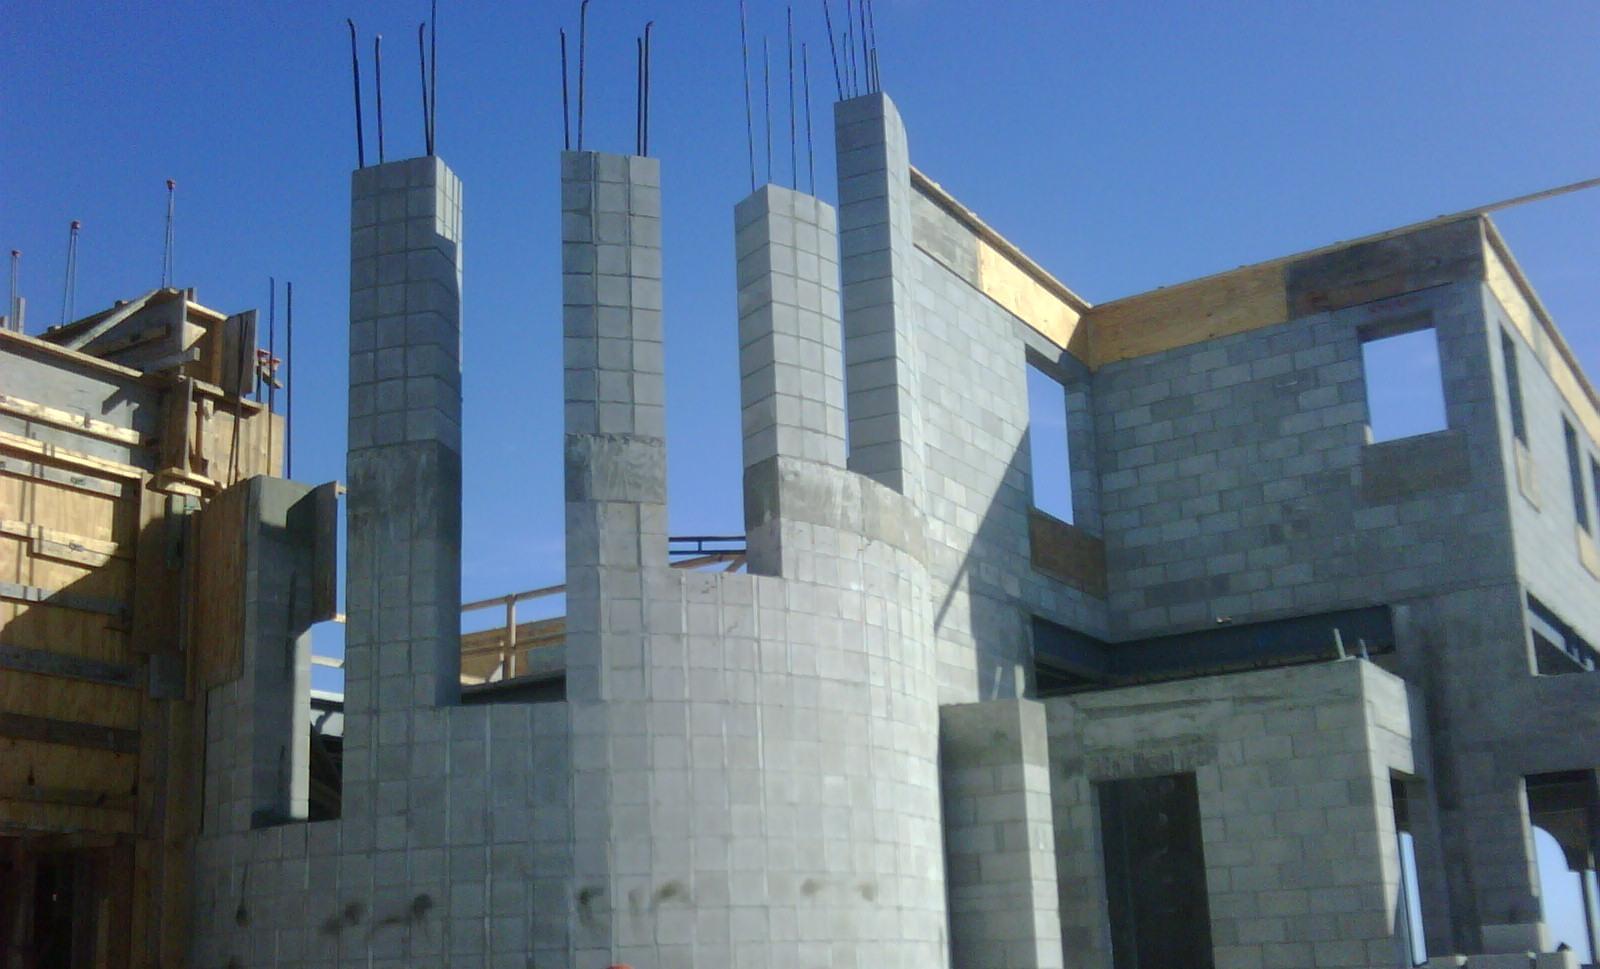 18,000 sqft Residence - Raduis CMU